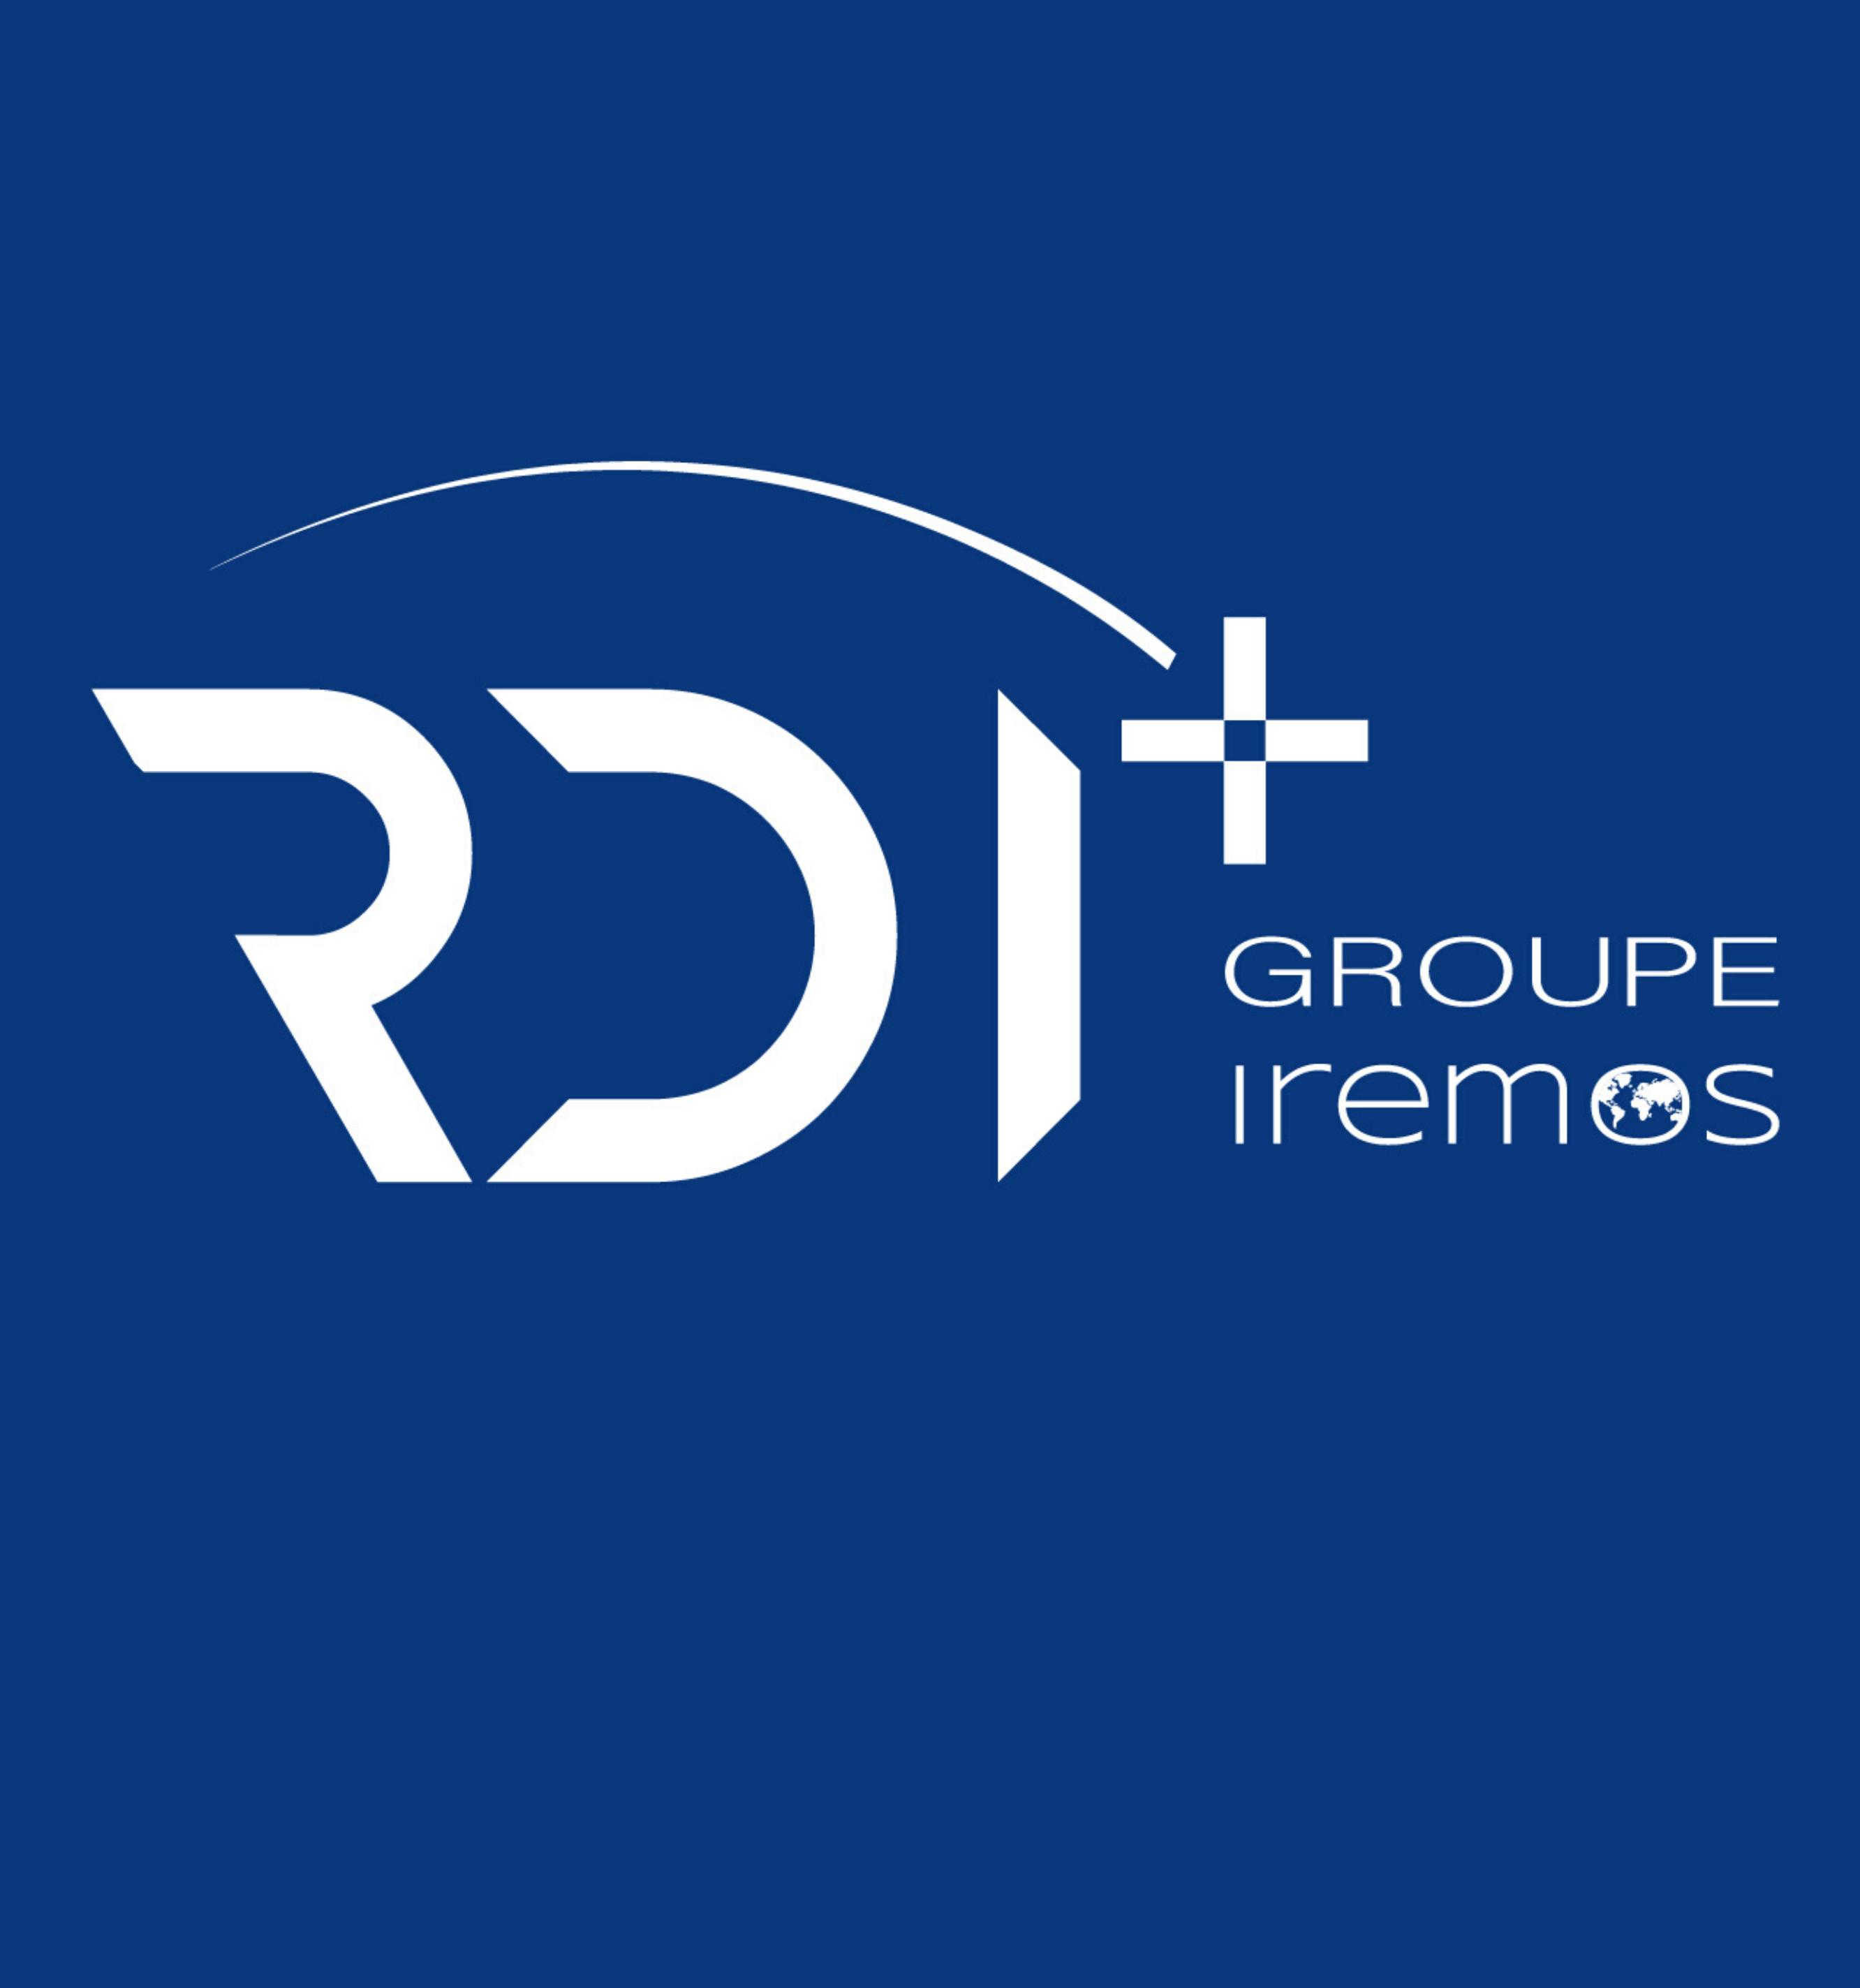 iremos-logiciel-thom-as-rdi+-direction-renseignement-securite-defense-drsd (1)